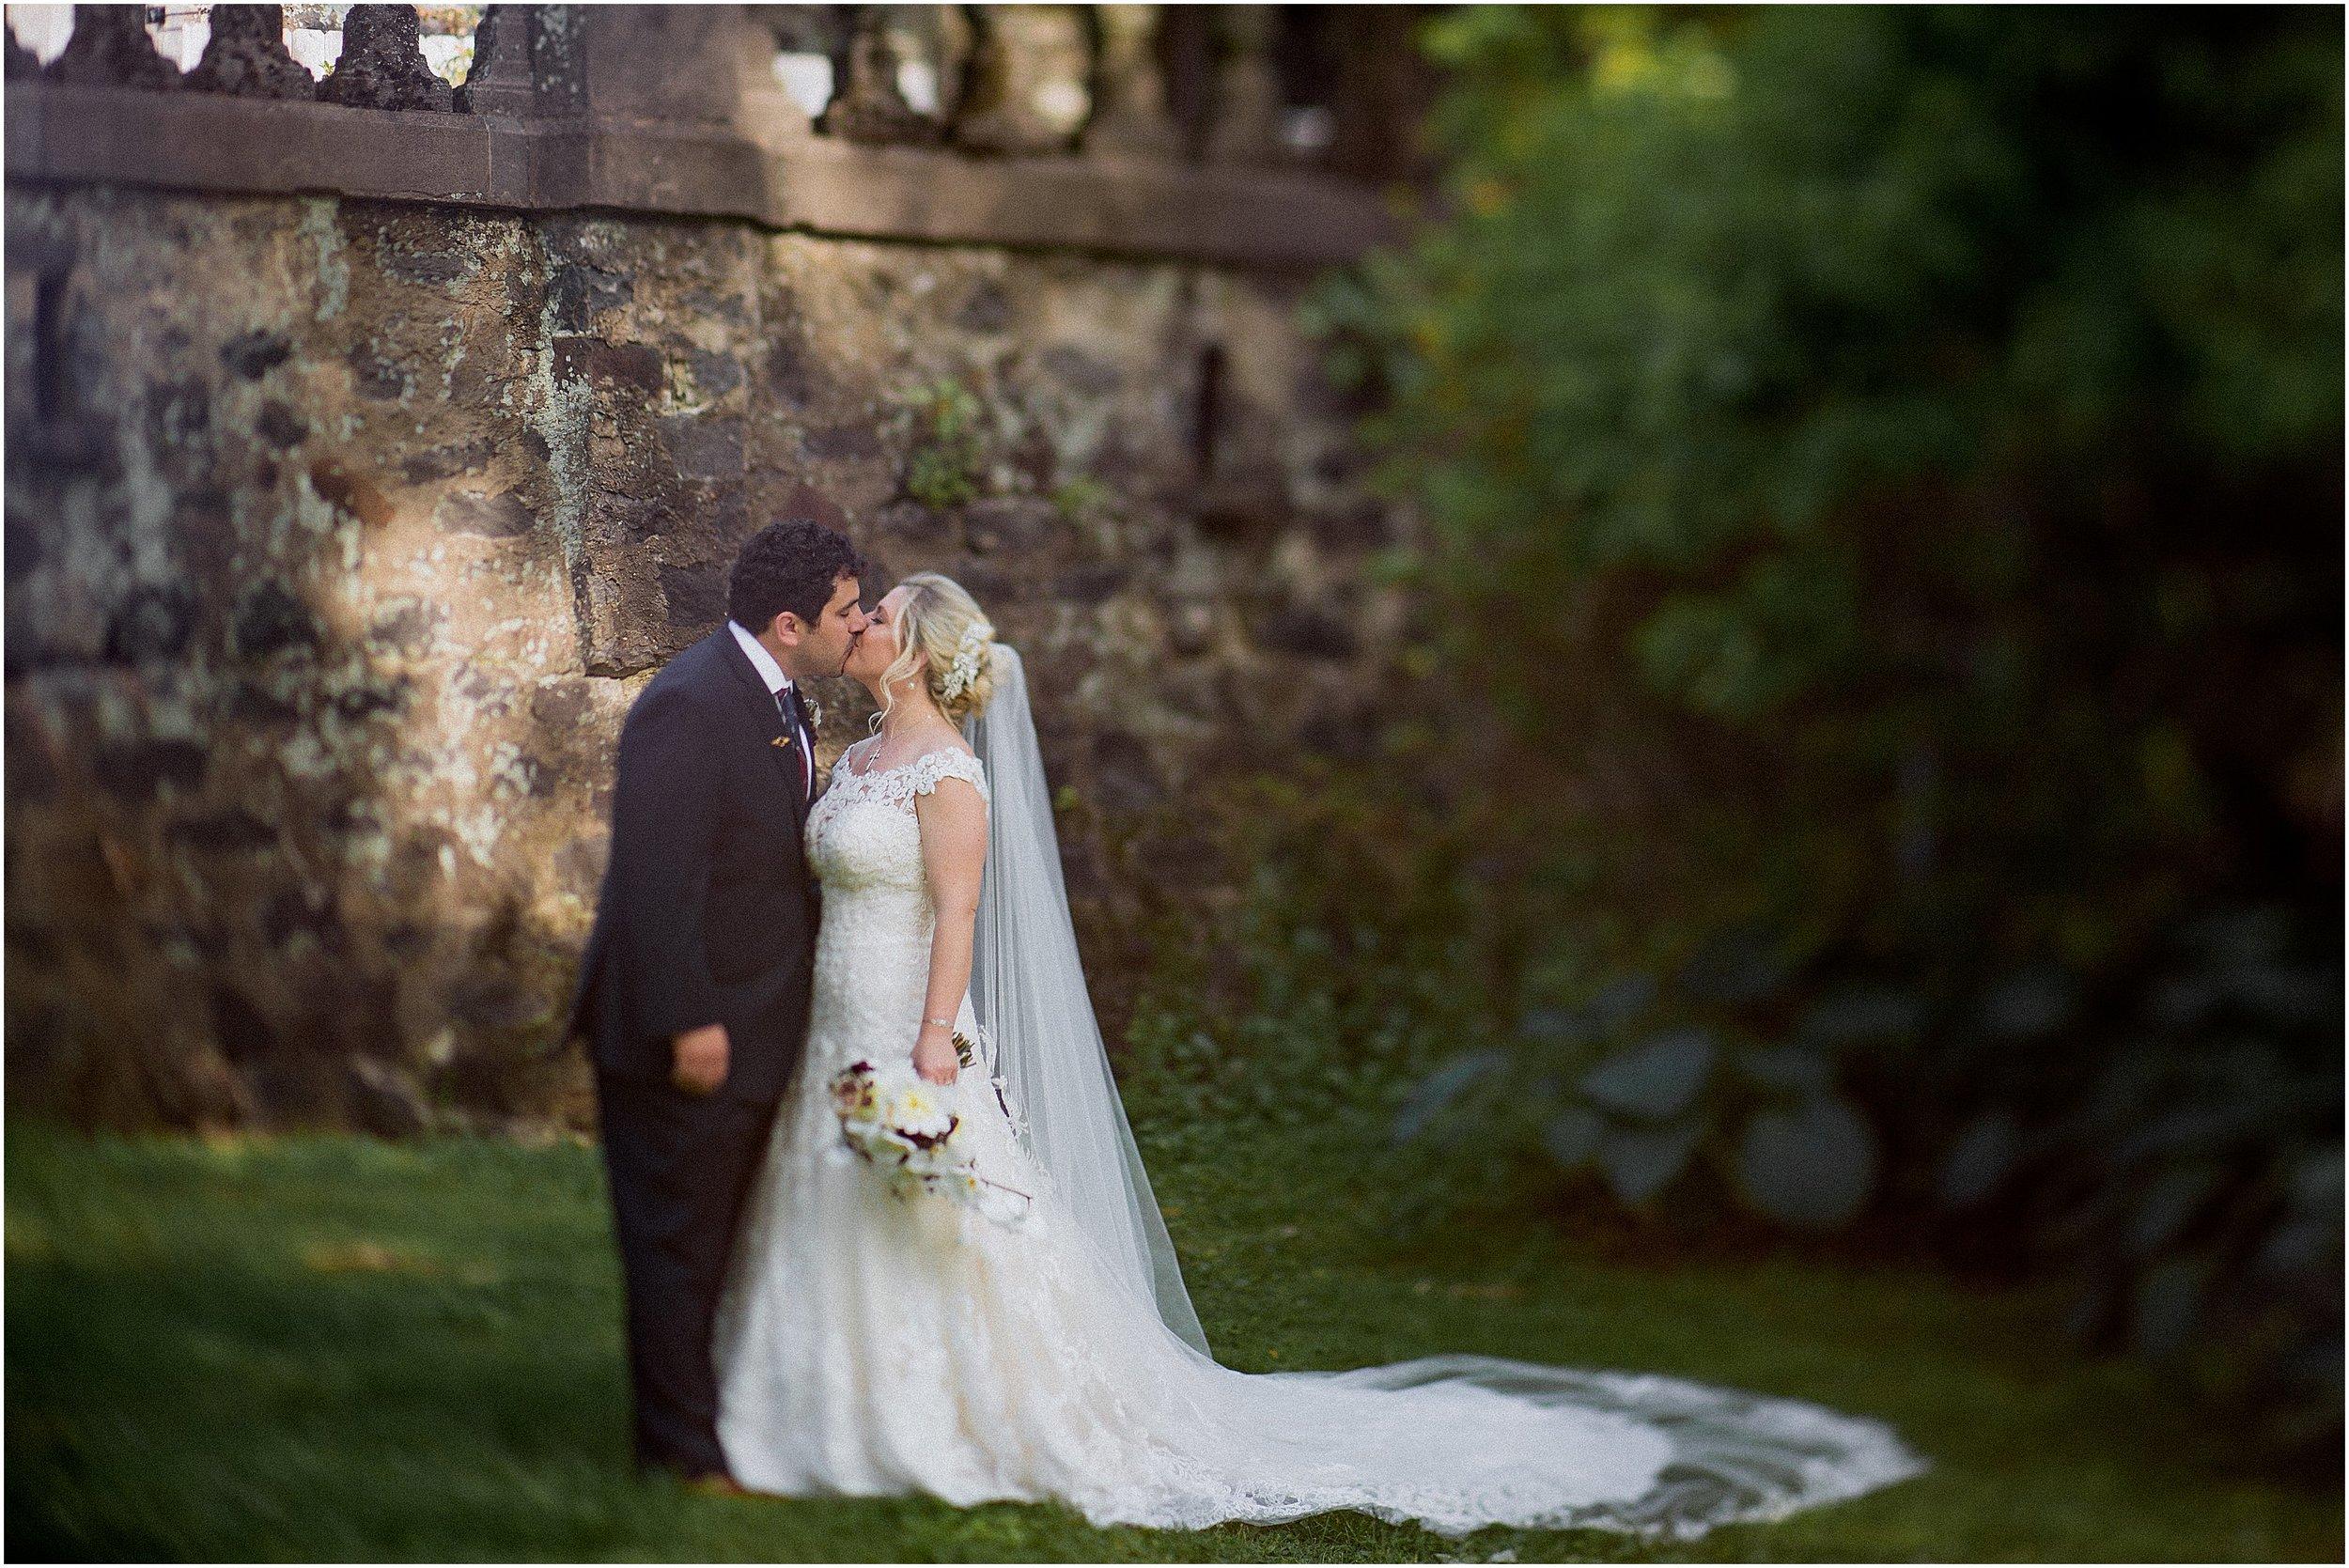 Philly_Wedding_Photographer_0035.jpg